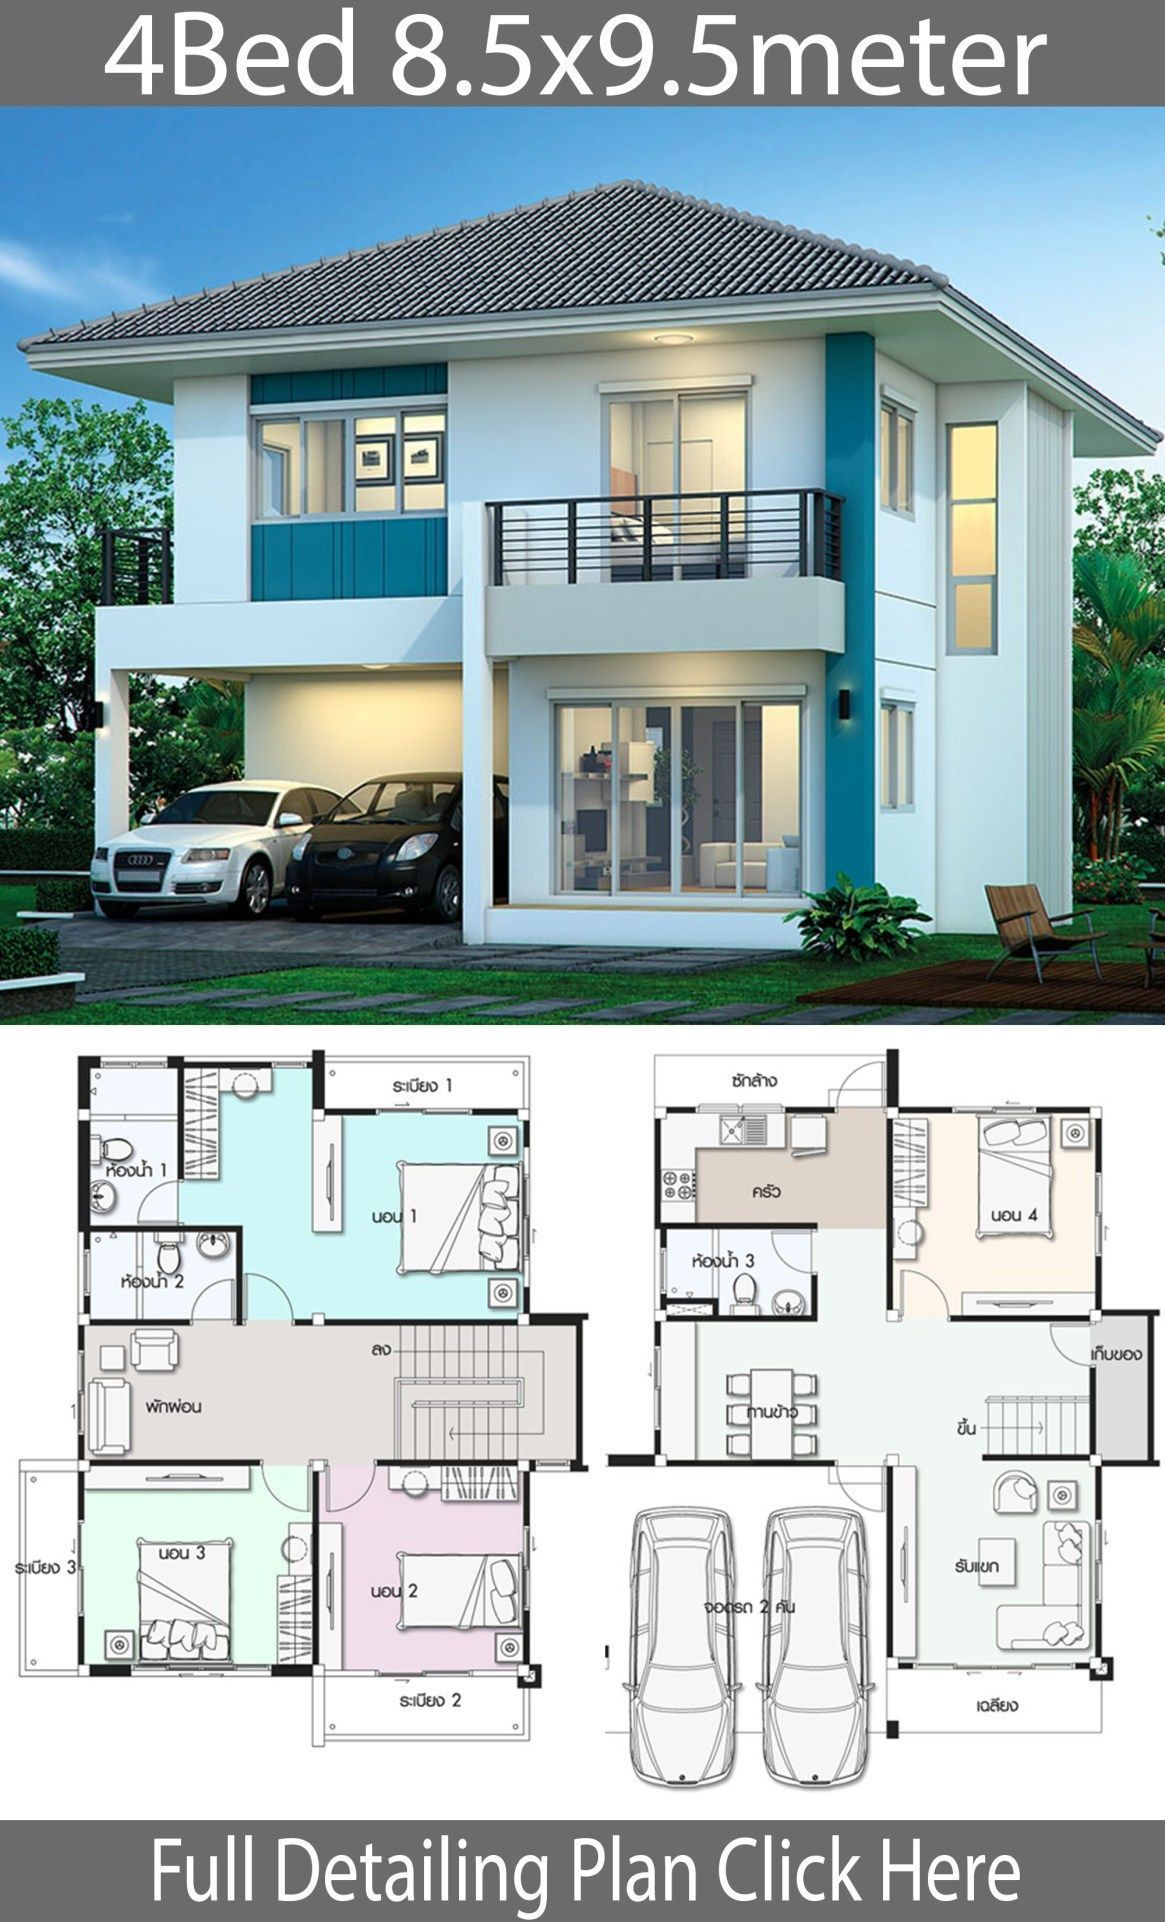 House Design Plan 8 5x9 5m With 4 Bedrooms Hausdesign House Design Plan 8 5x9 5 Small House Design Exterior Bungalow House Design House Designs Exterior